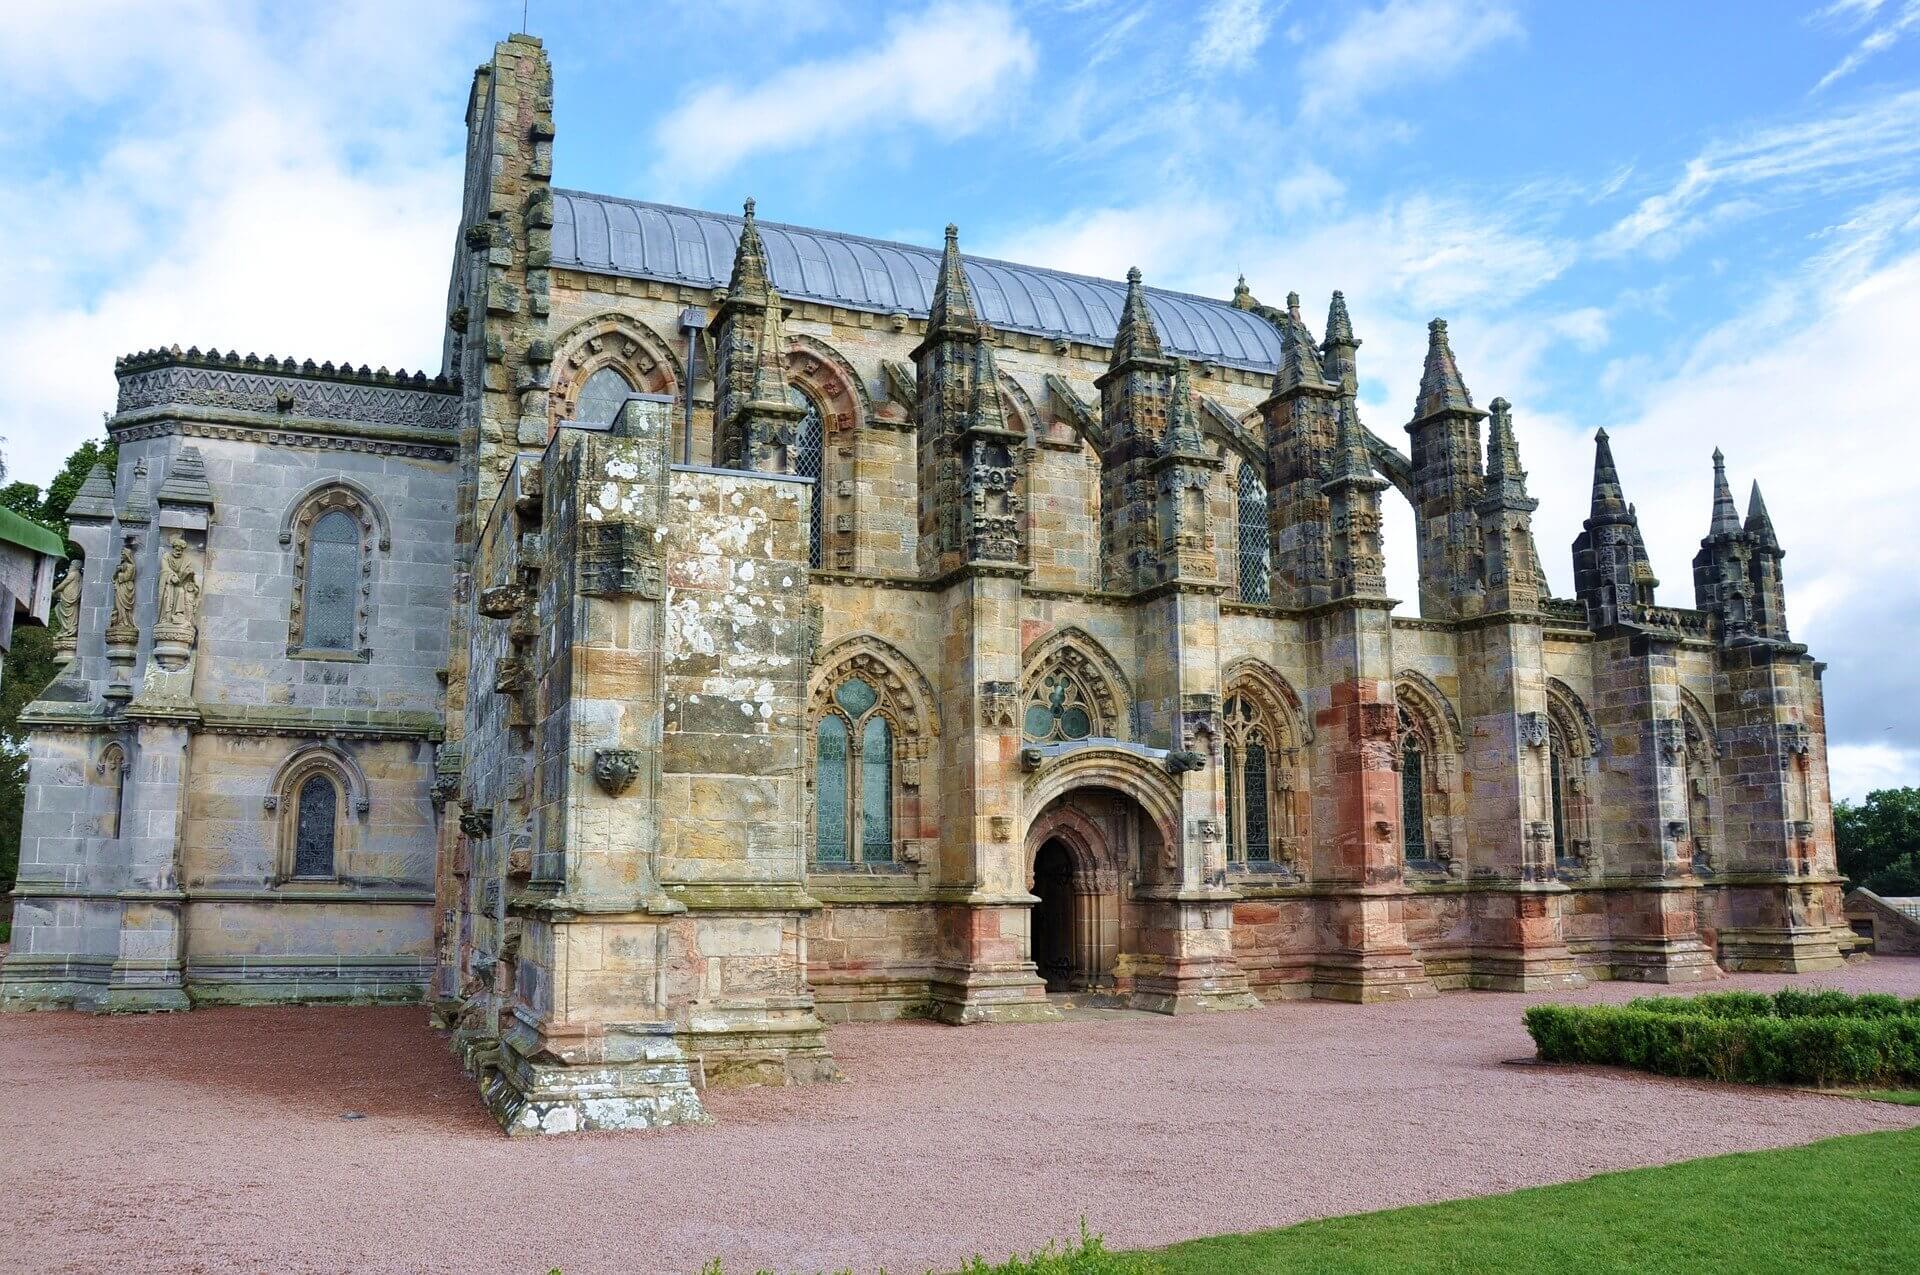 exterior of Rosslyn Chapel near Edinburgh in Scotland